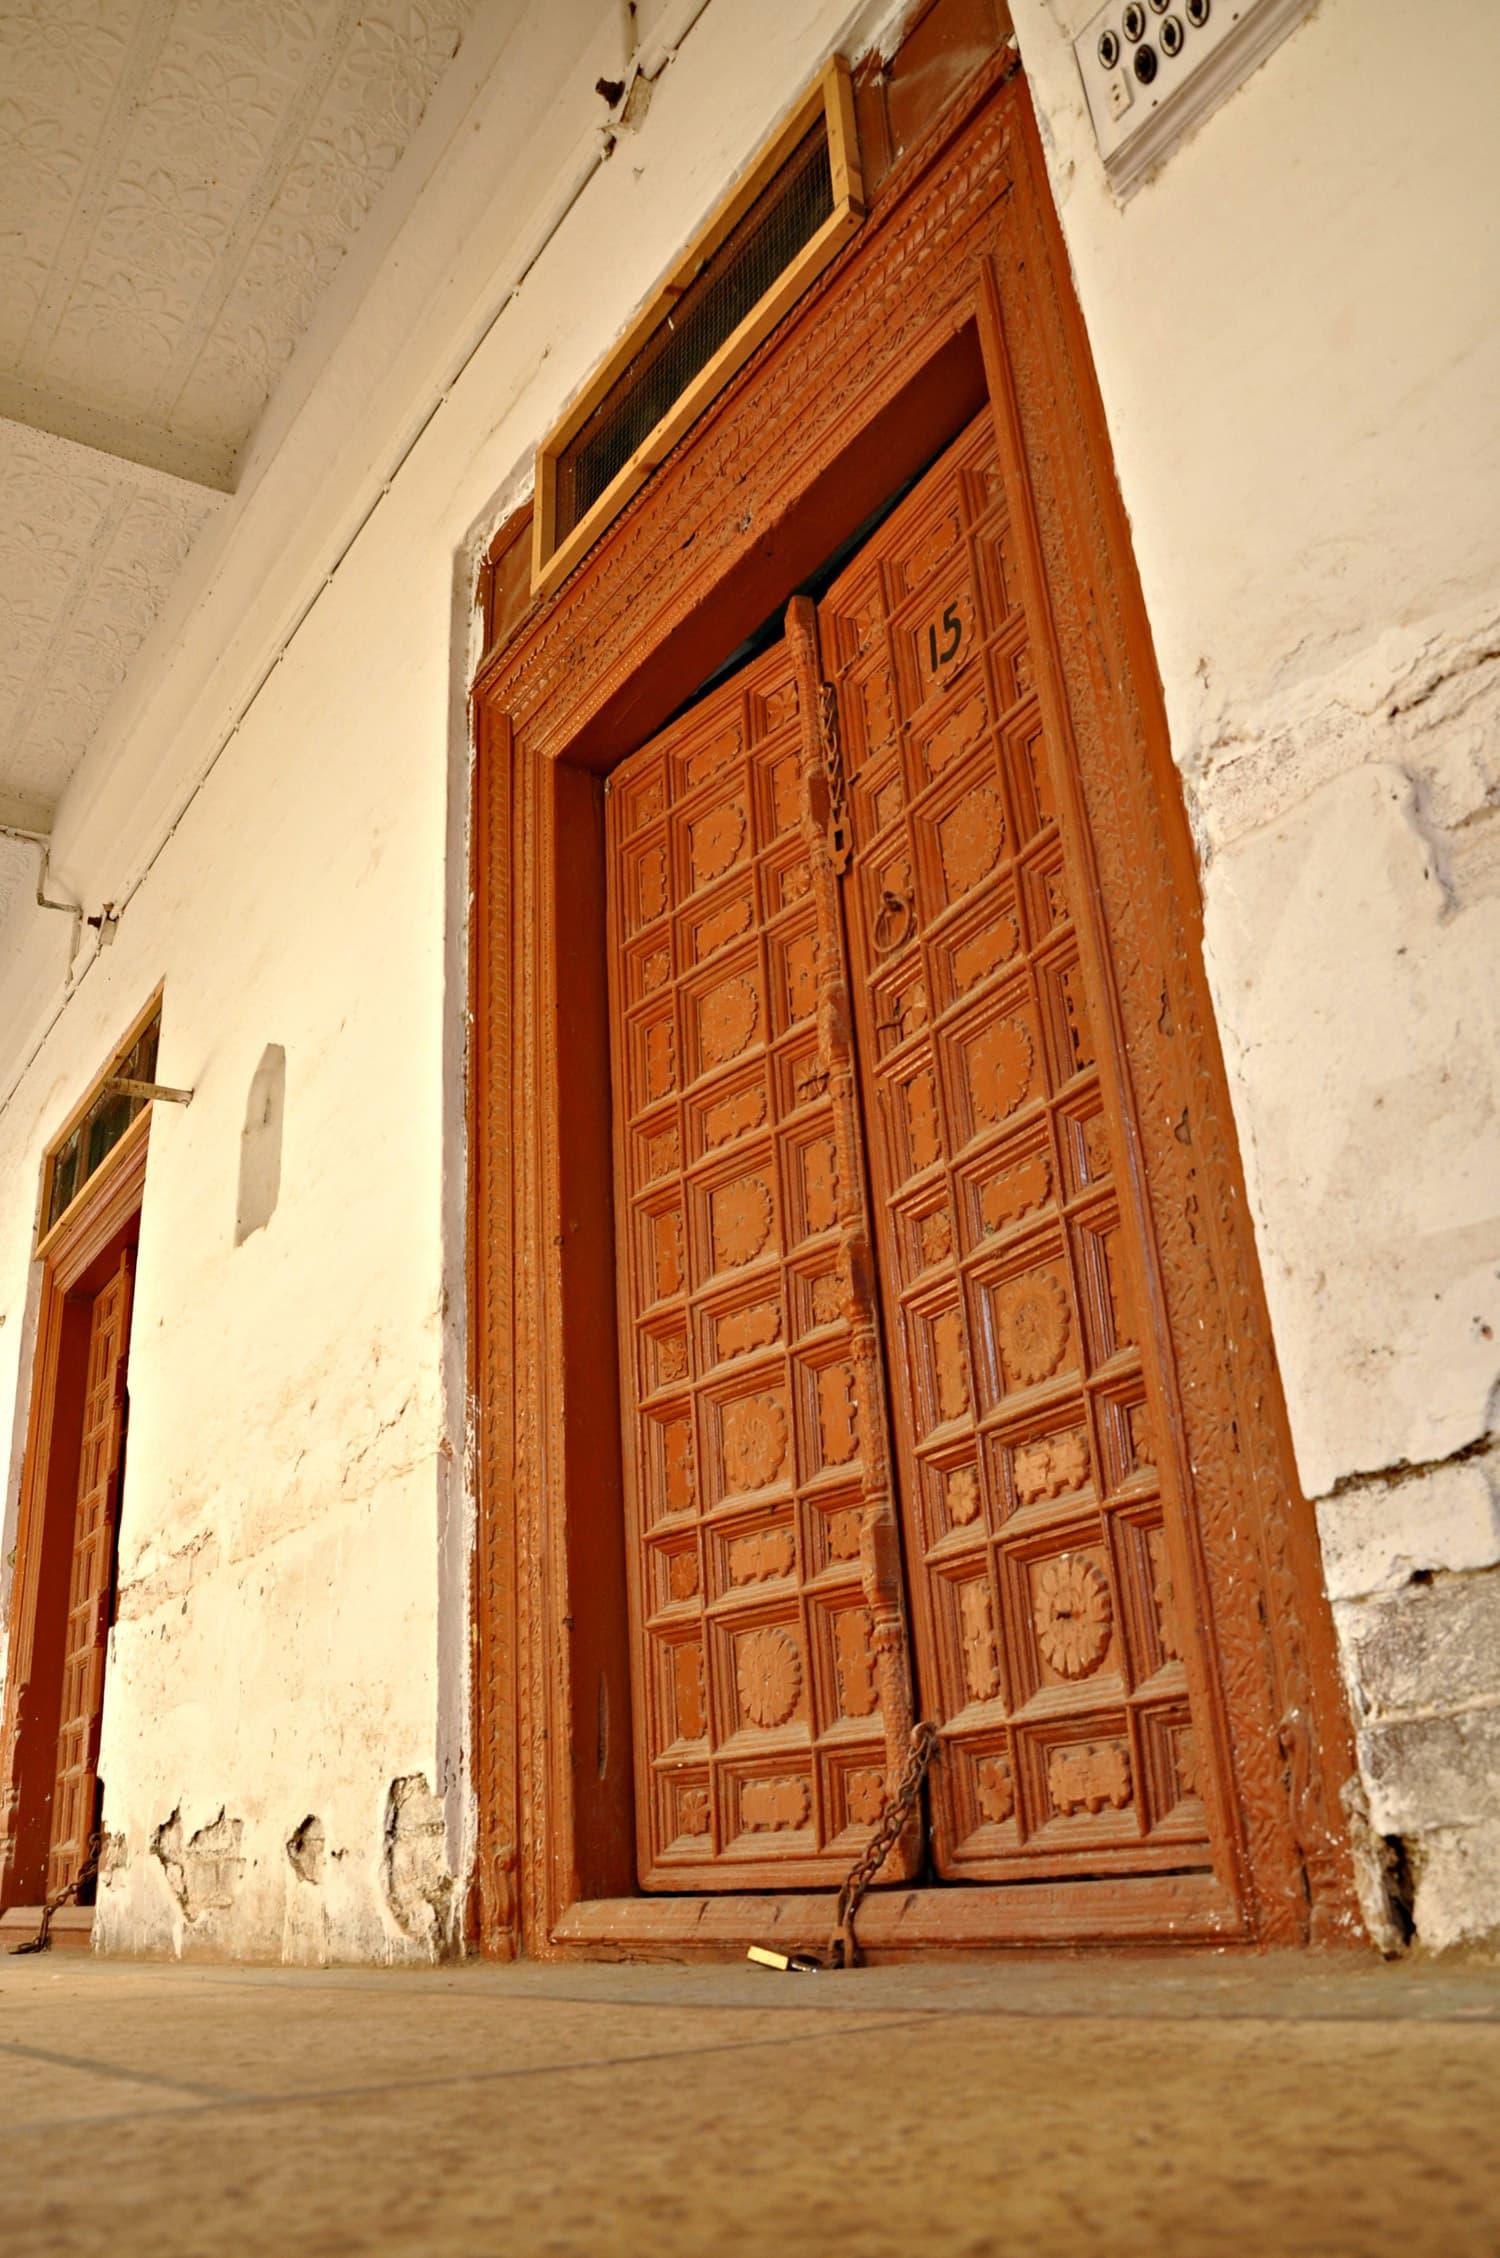 Sadho Belo - Doors to the hostel